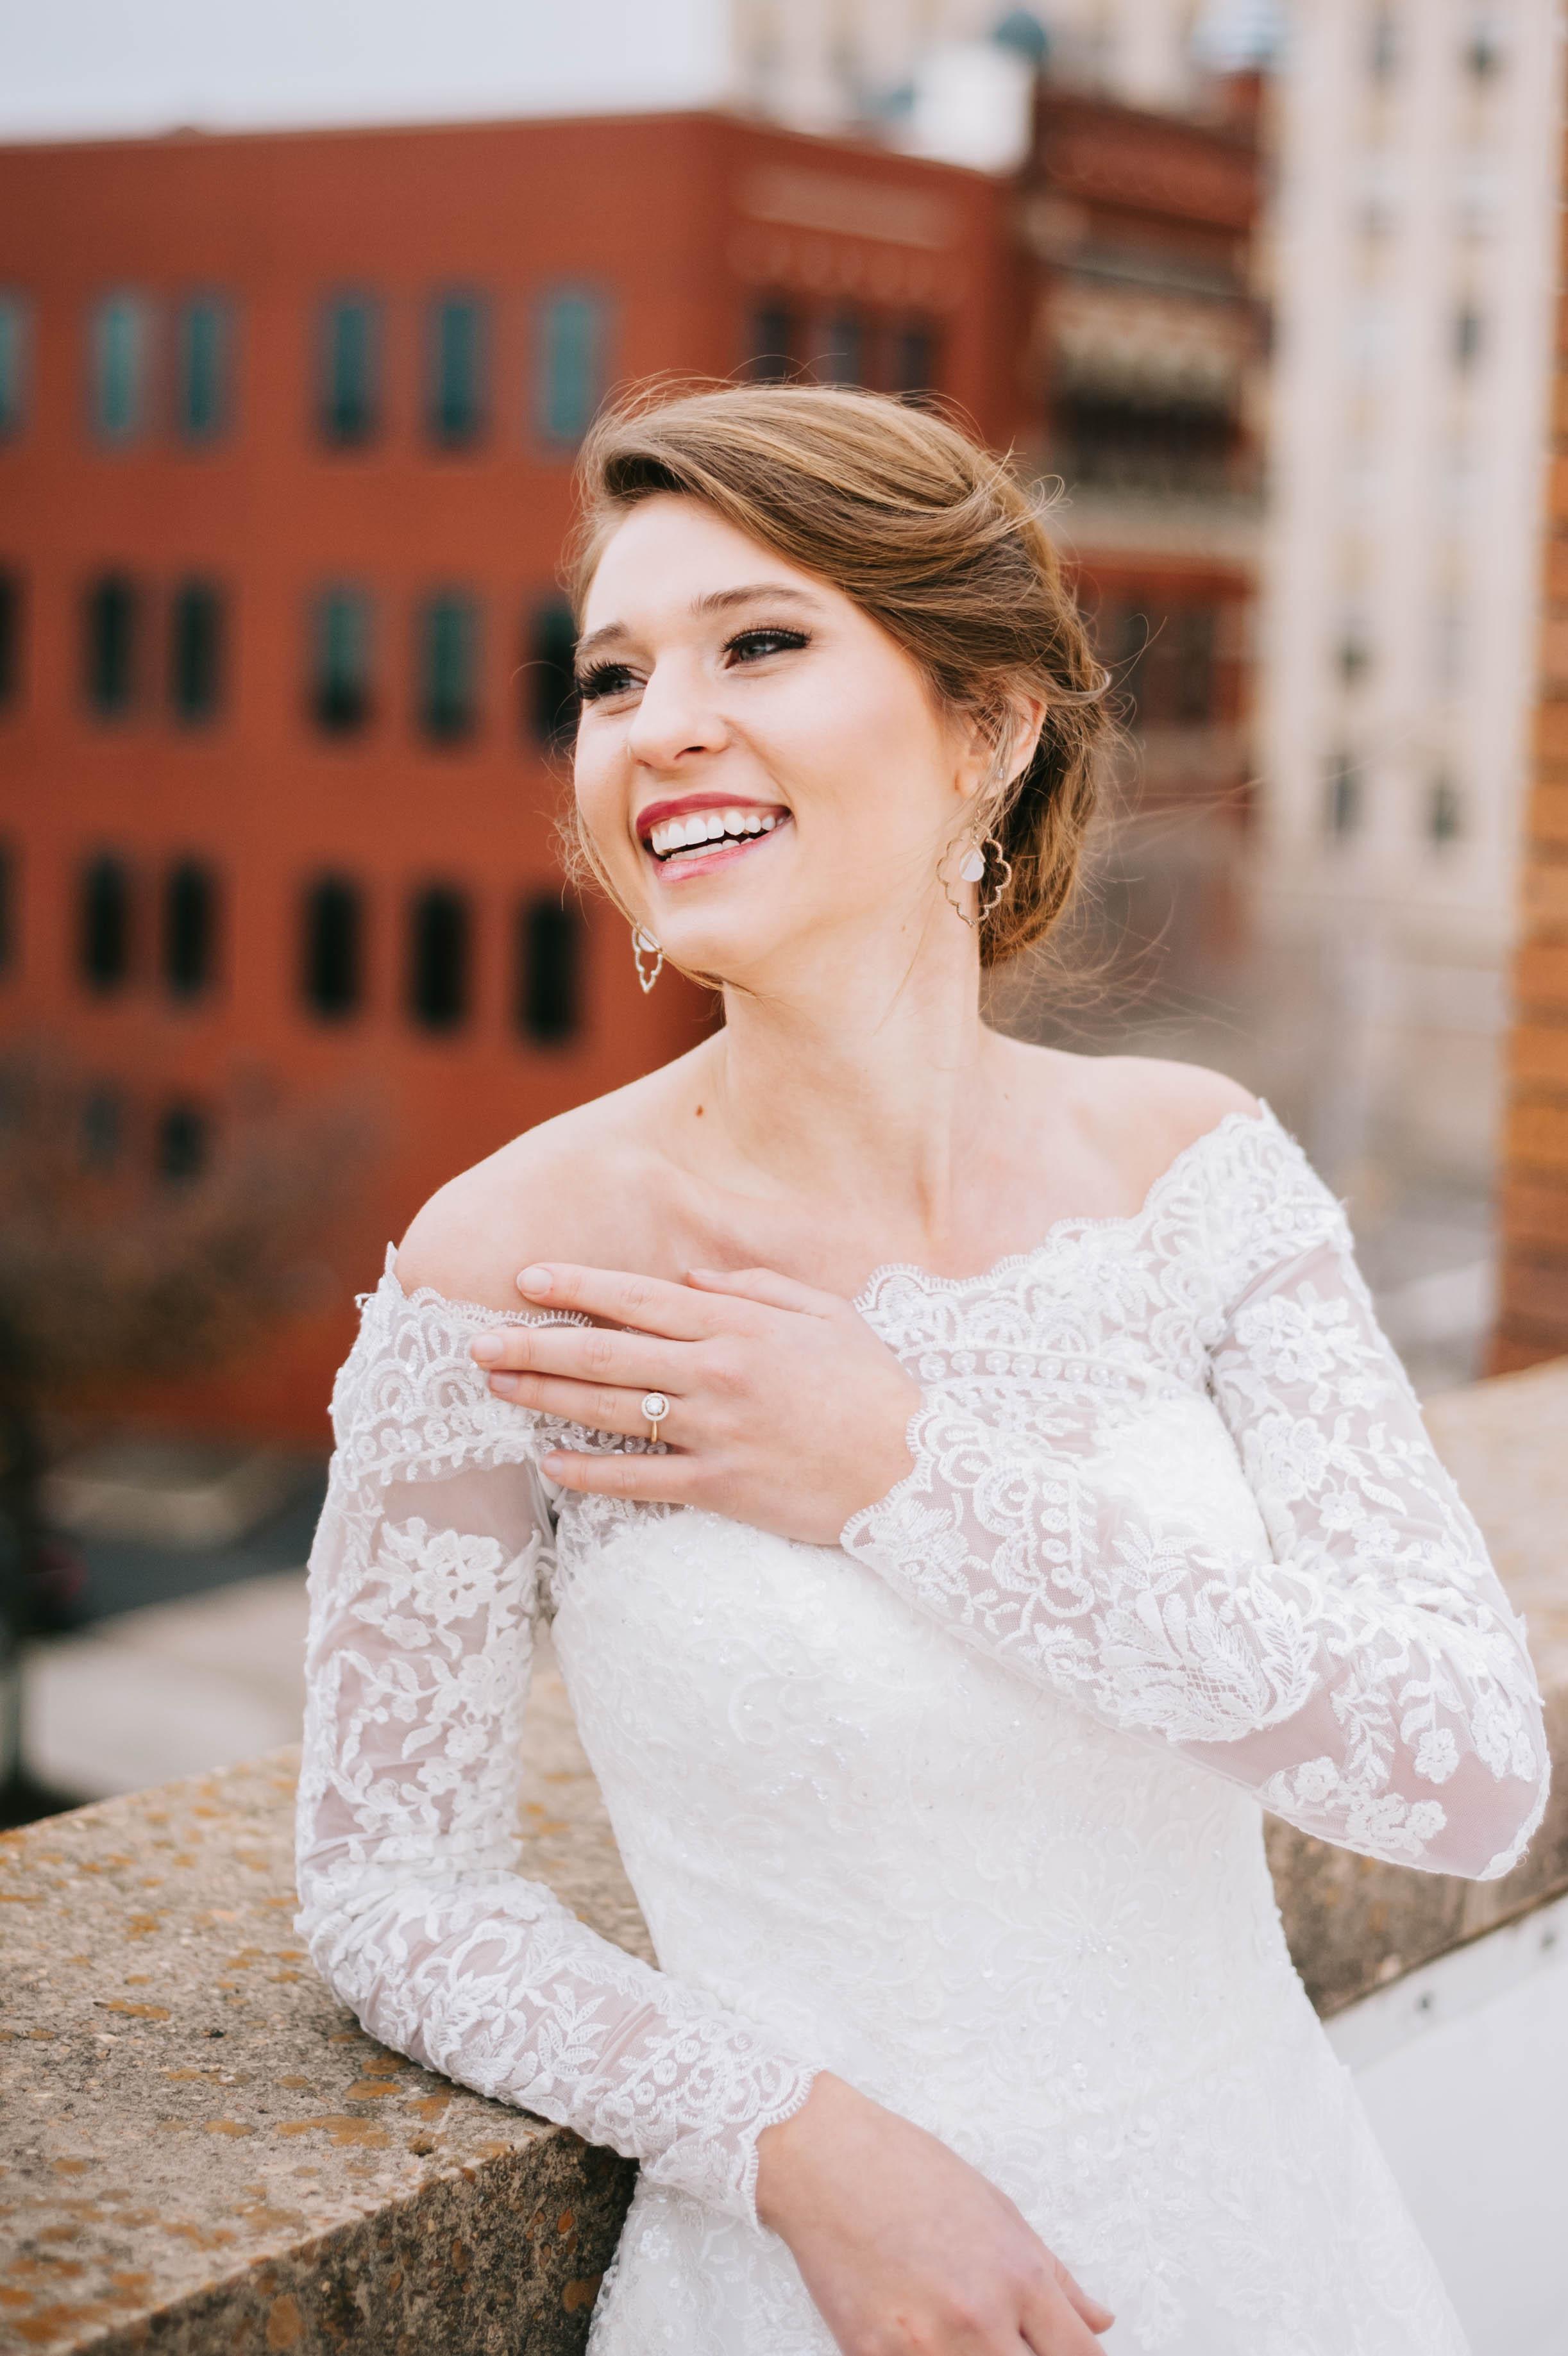 Hannah Steward Baskin | Bridals (74 of 74).jpg